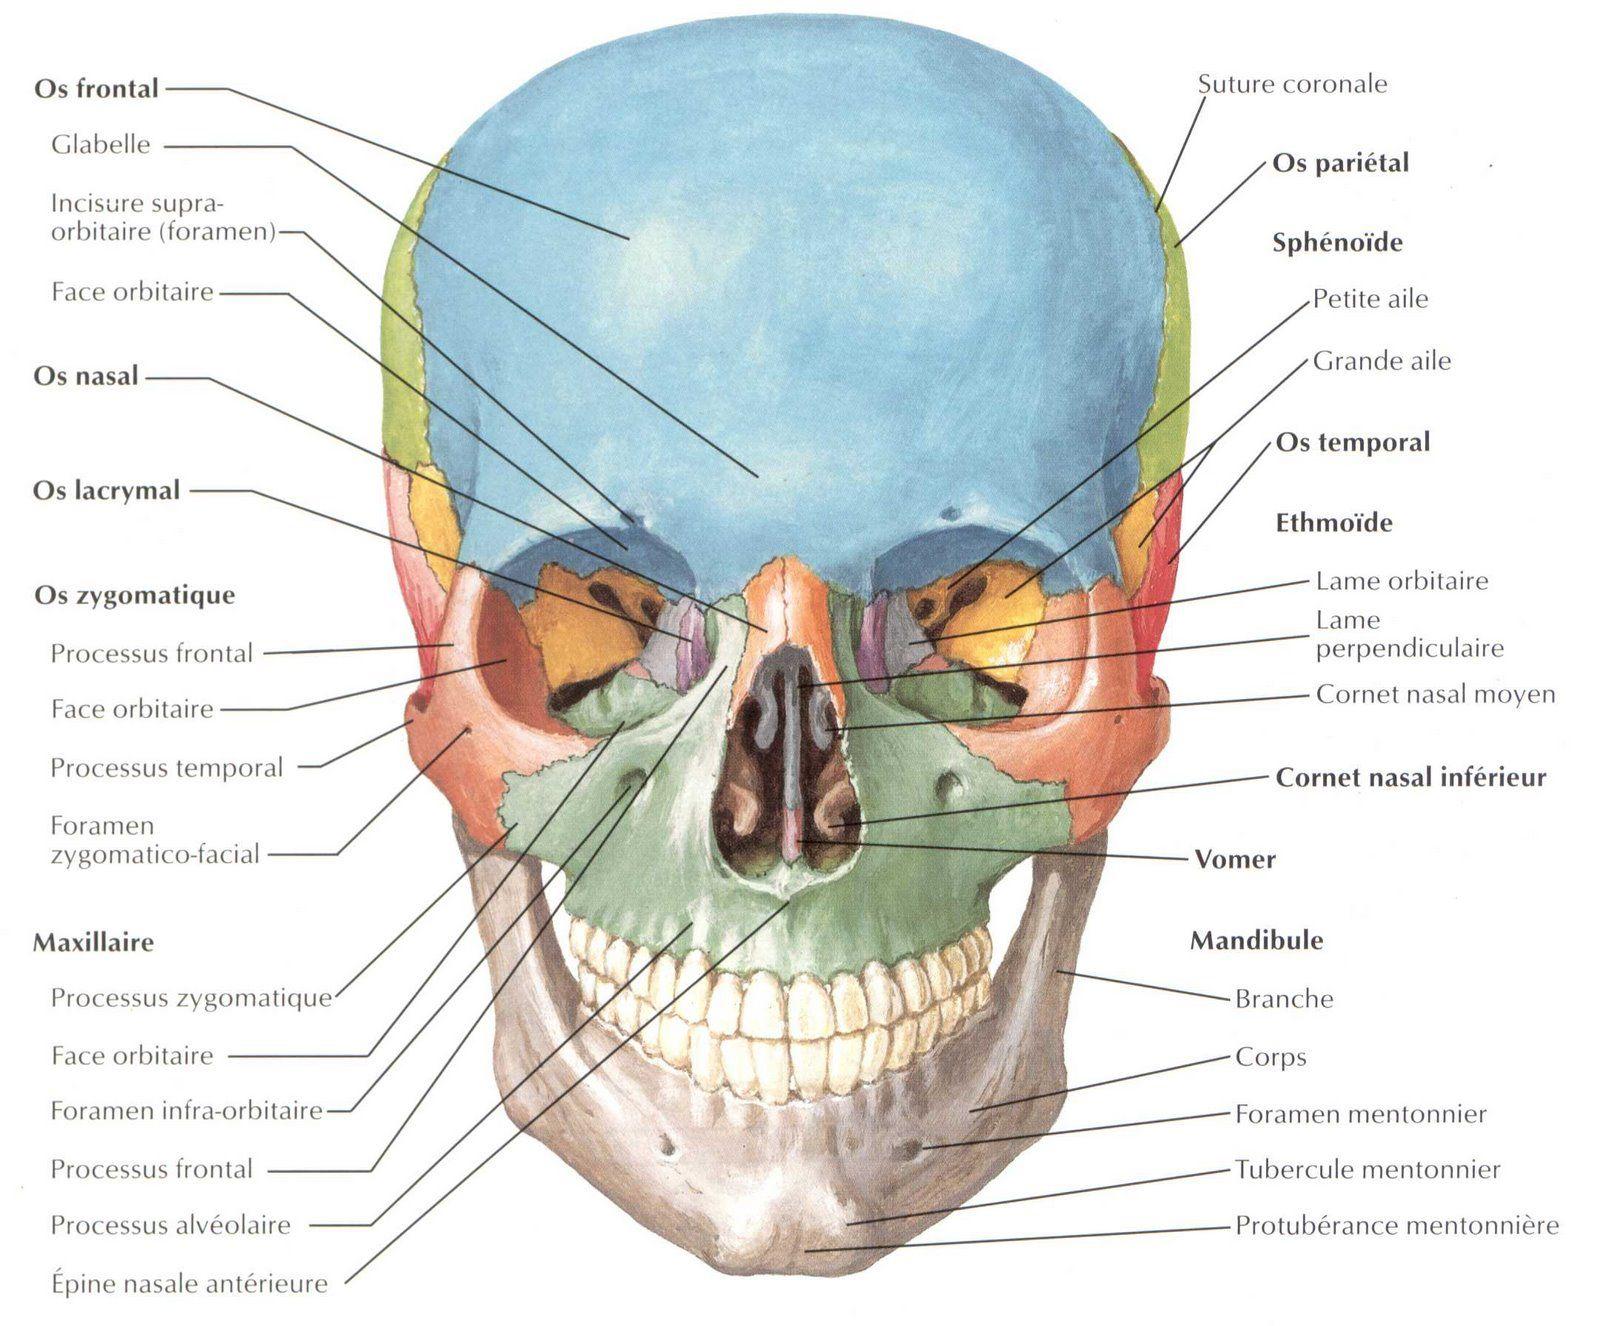 squelette-crane-face.jpg (1600×1326) | Anatomia | Pinterest ...